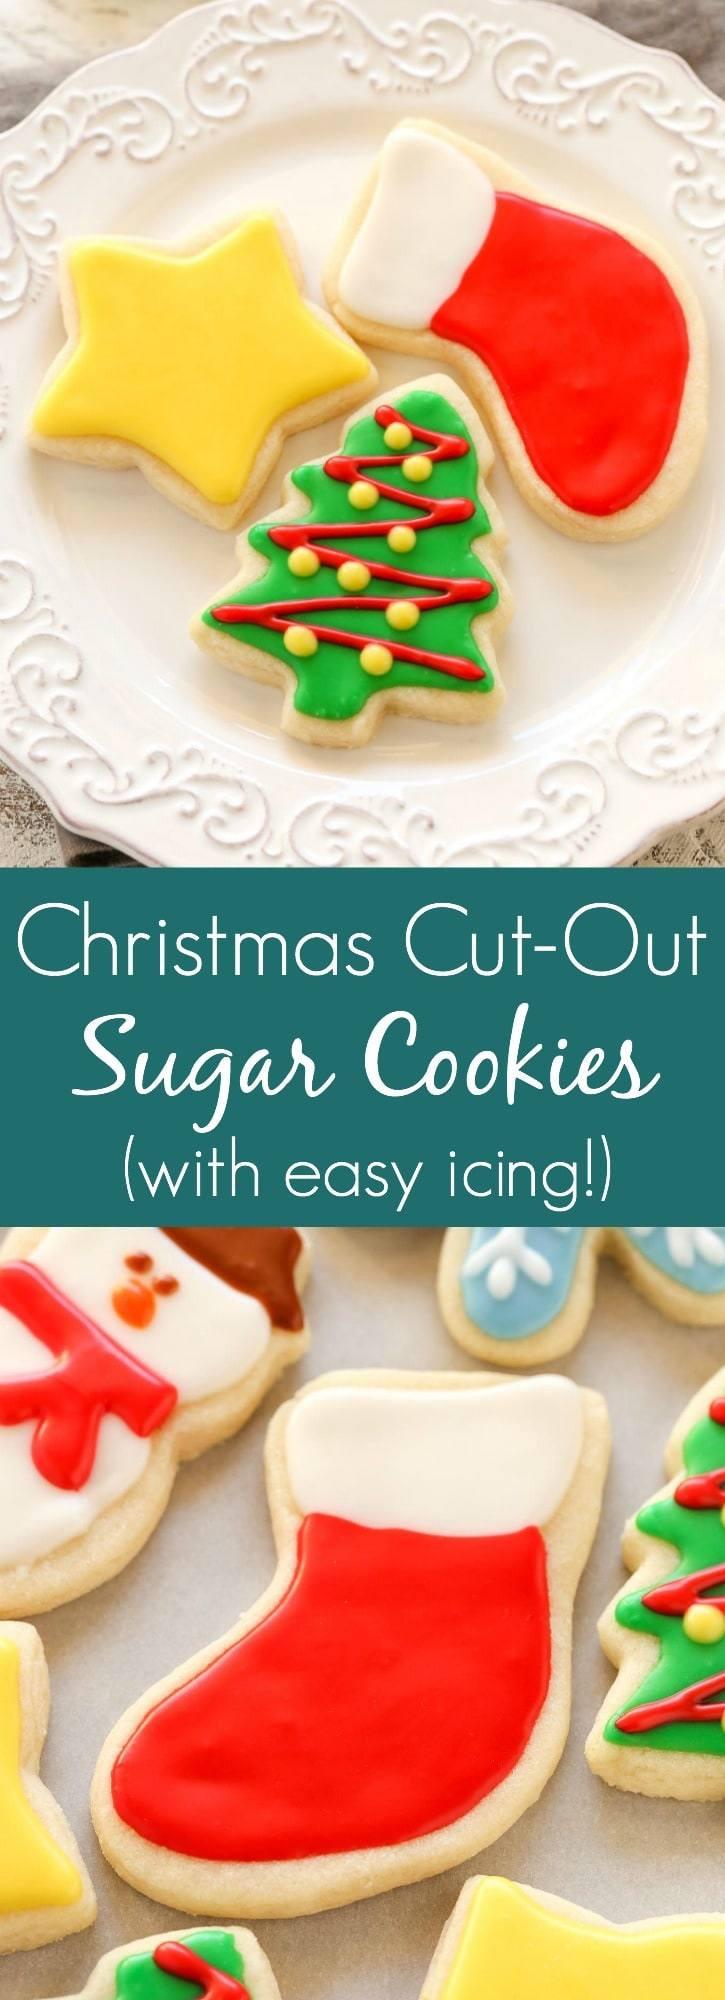 Soft Christmas Sugar Cookies  Soft Christmas Cut Out Sugar Cookies Live Well Bake ten